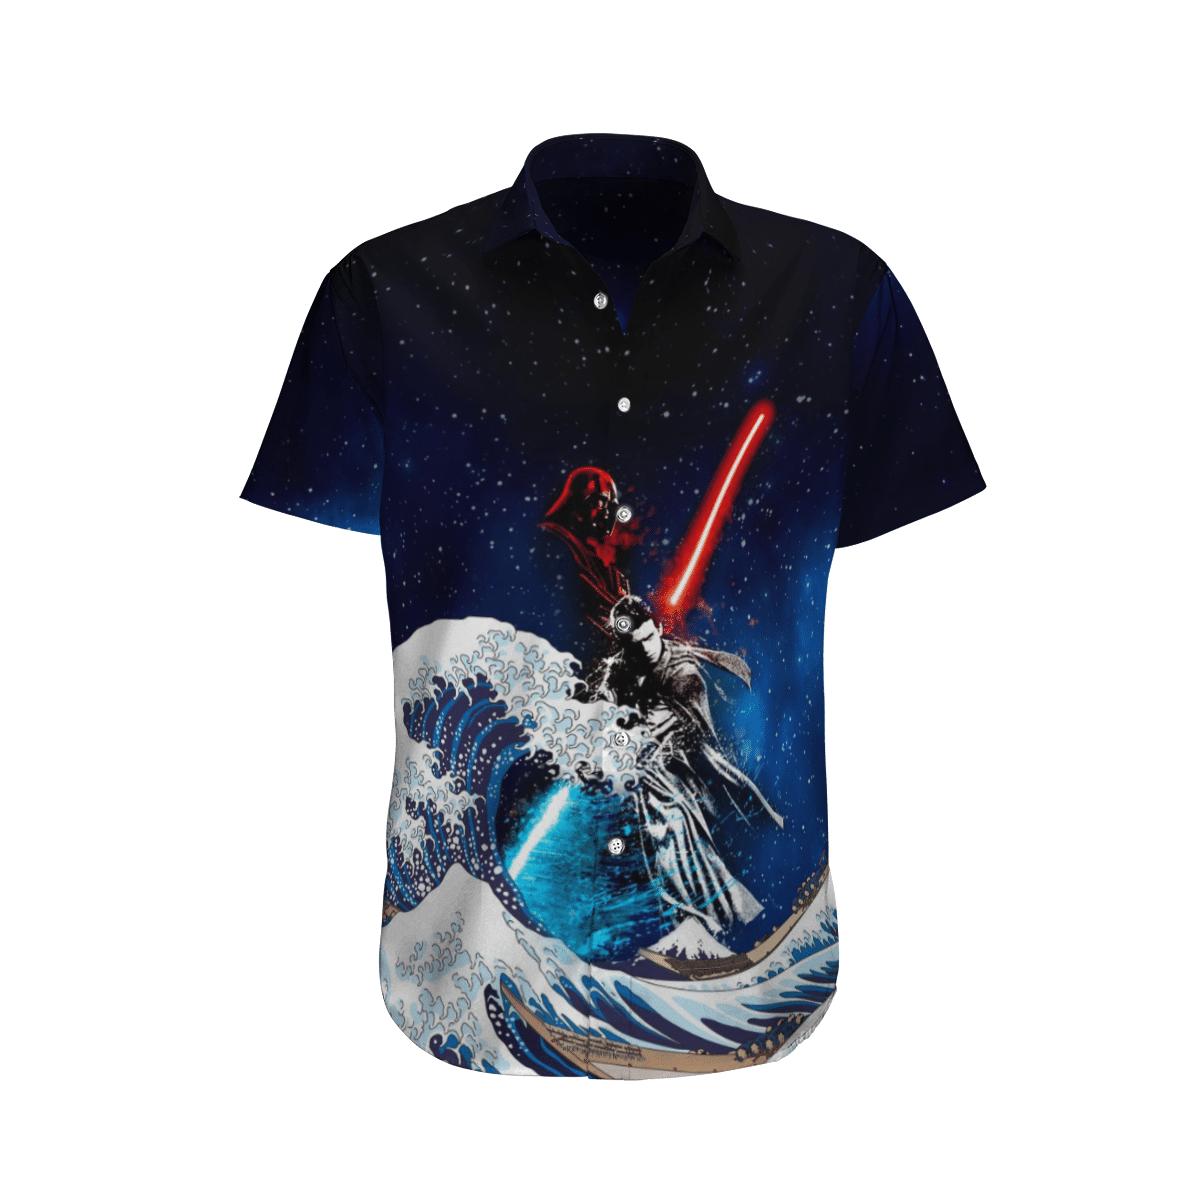 Star wars Battle Darth Vader and Luke Skywalker Waves Hawaiian Shirt